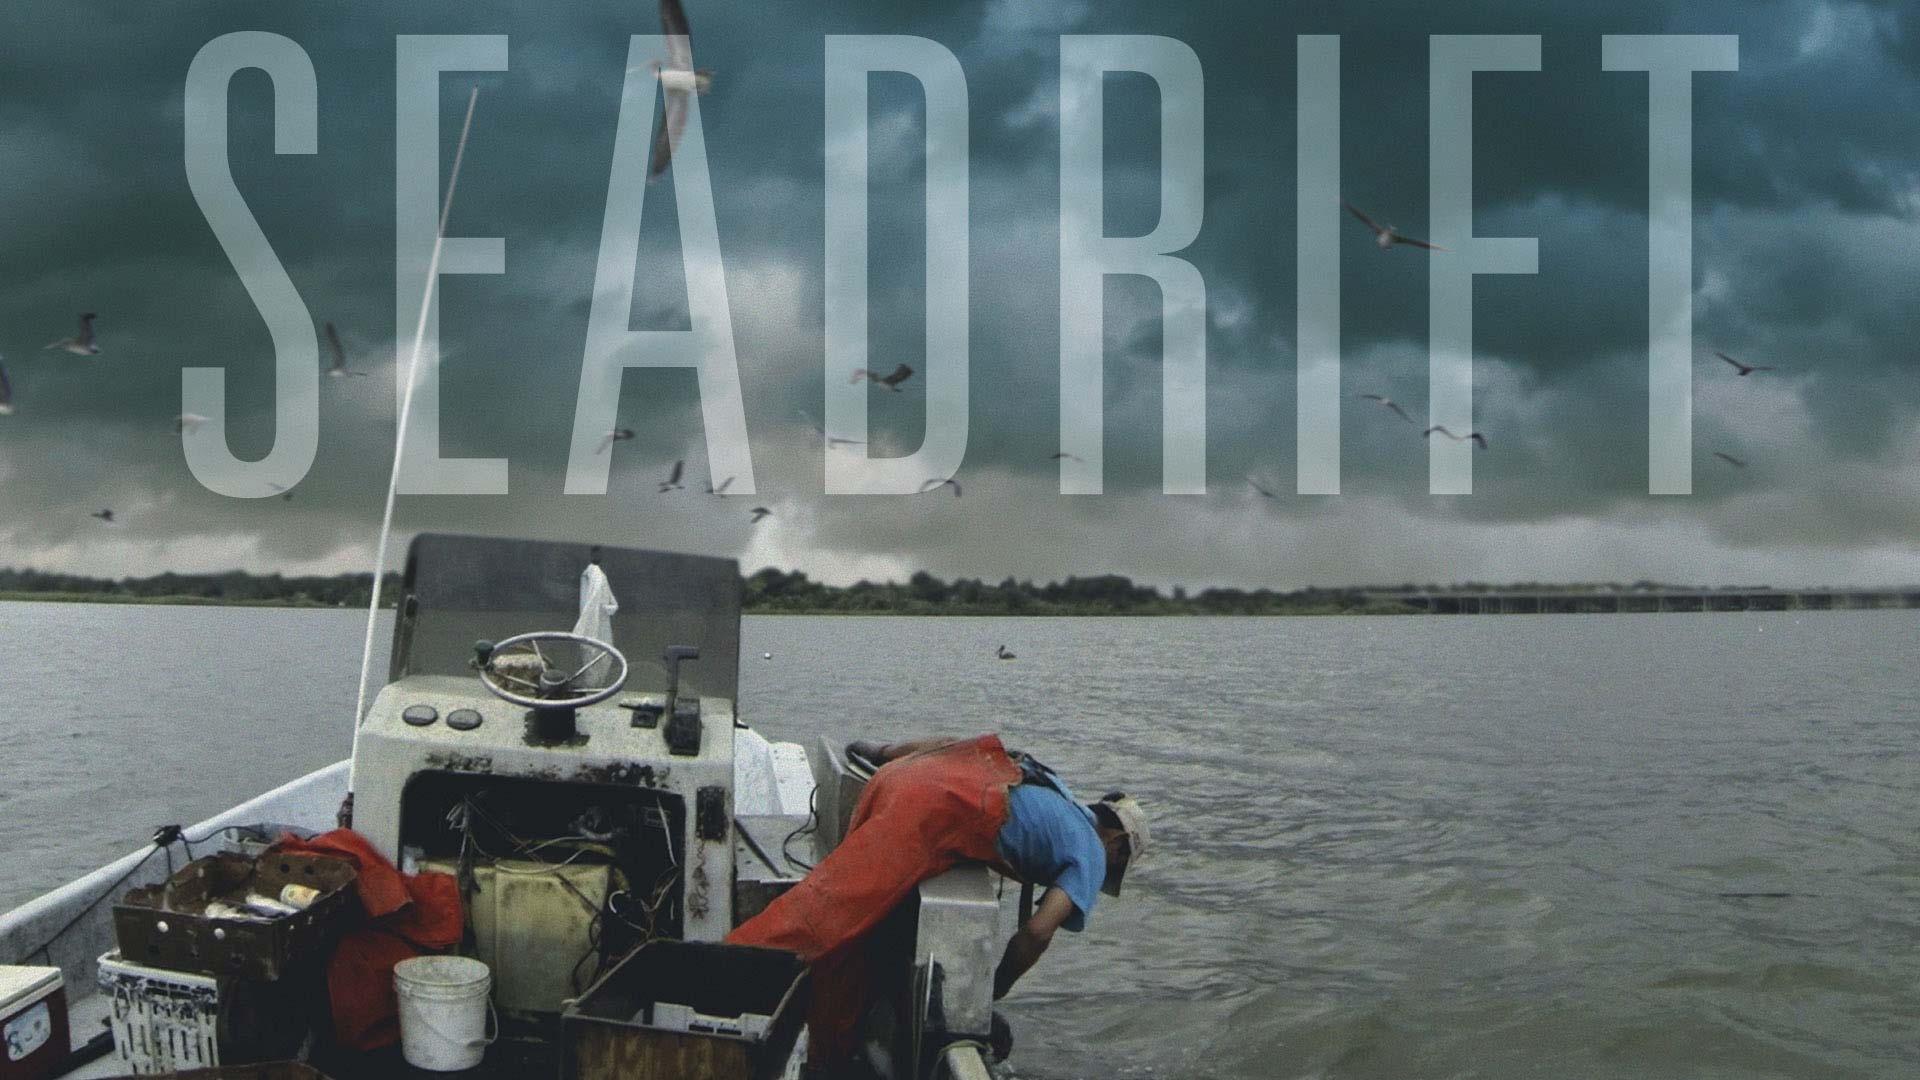 Seadrift - image